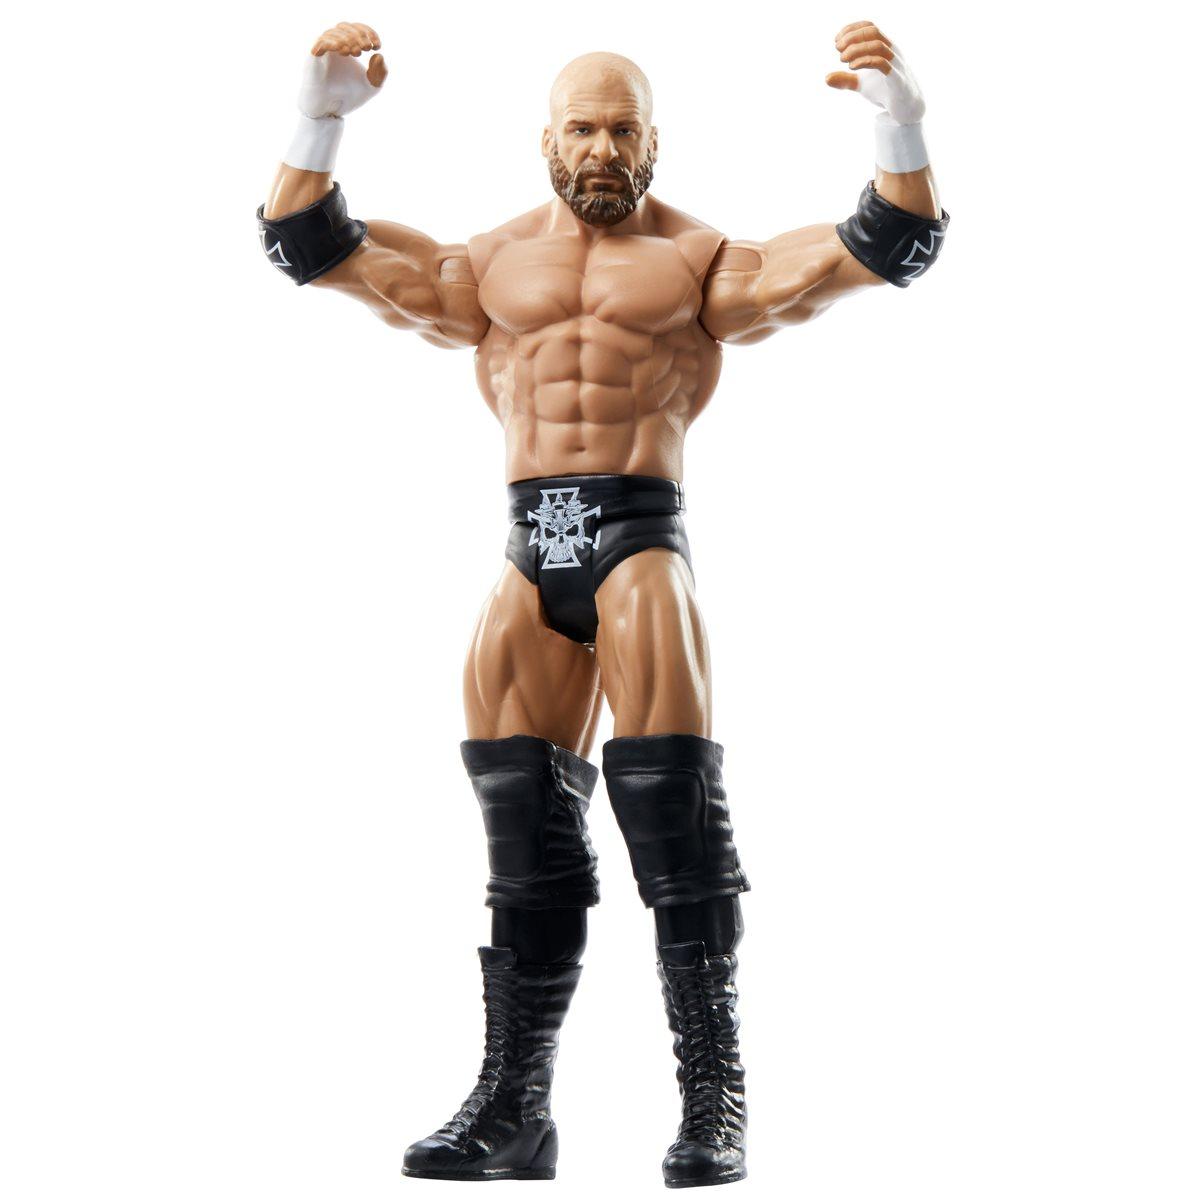 Wwe//Wwf MEGA RARE JOHNNY Gargano Wrestling Figure Series 106 a voir!!!